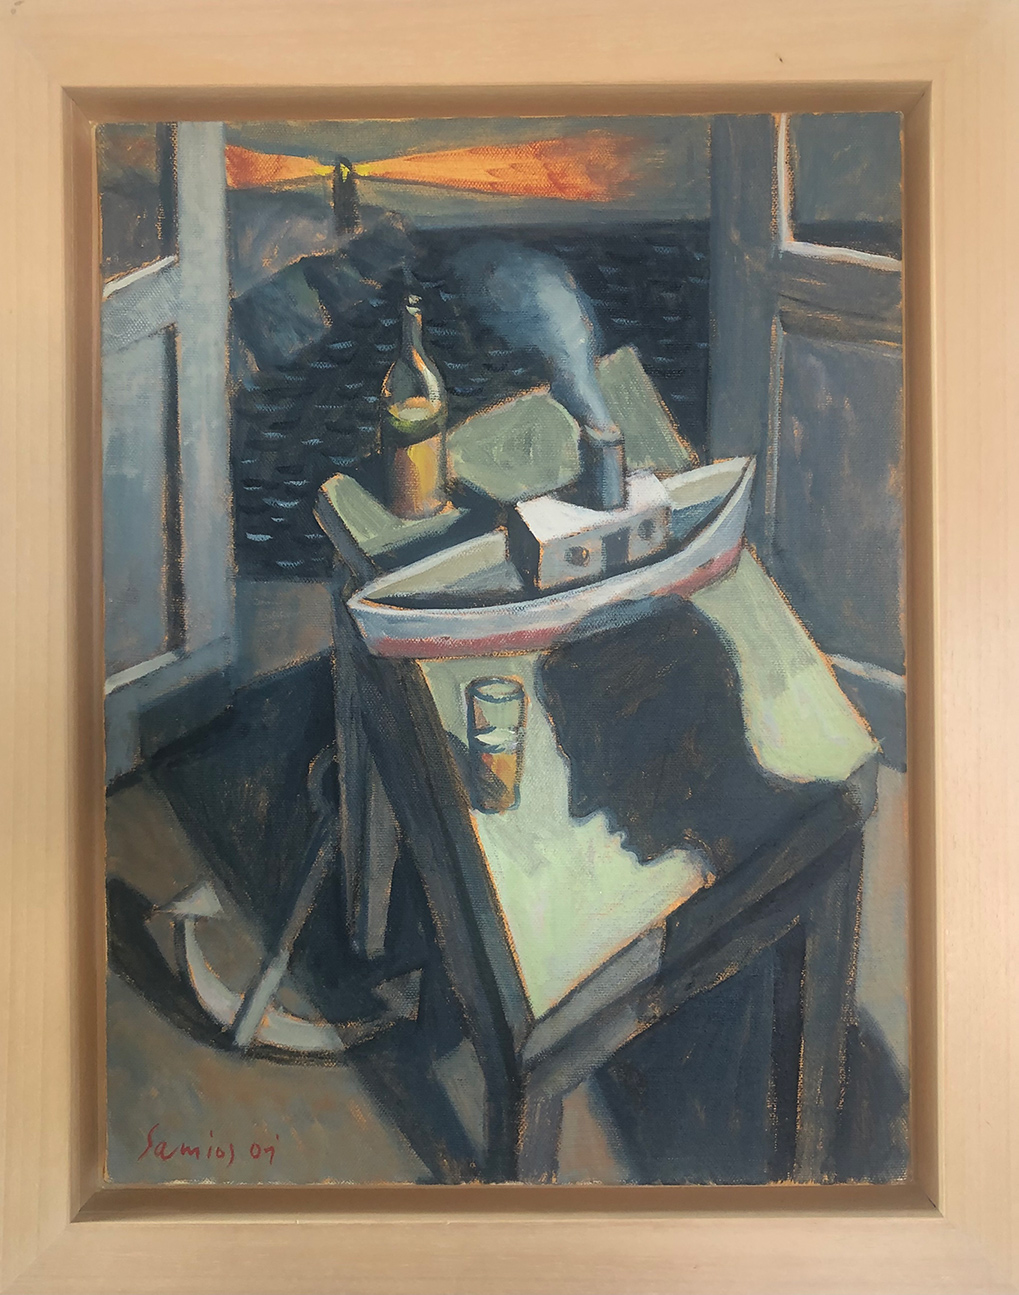 Still life, acrylics on canvas, 40x30 cm